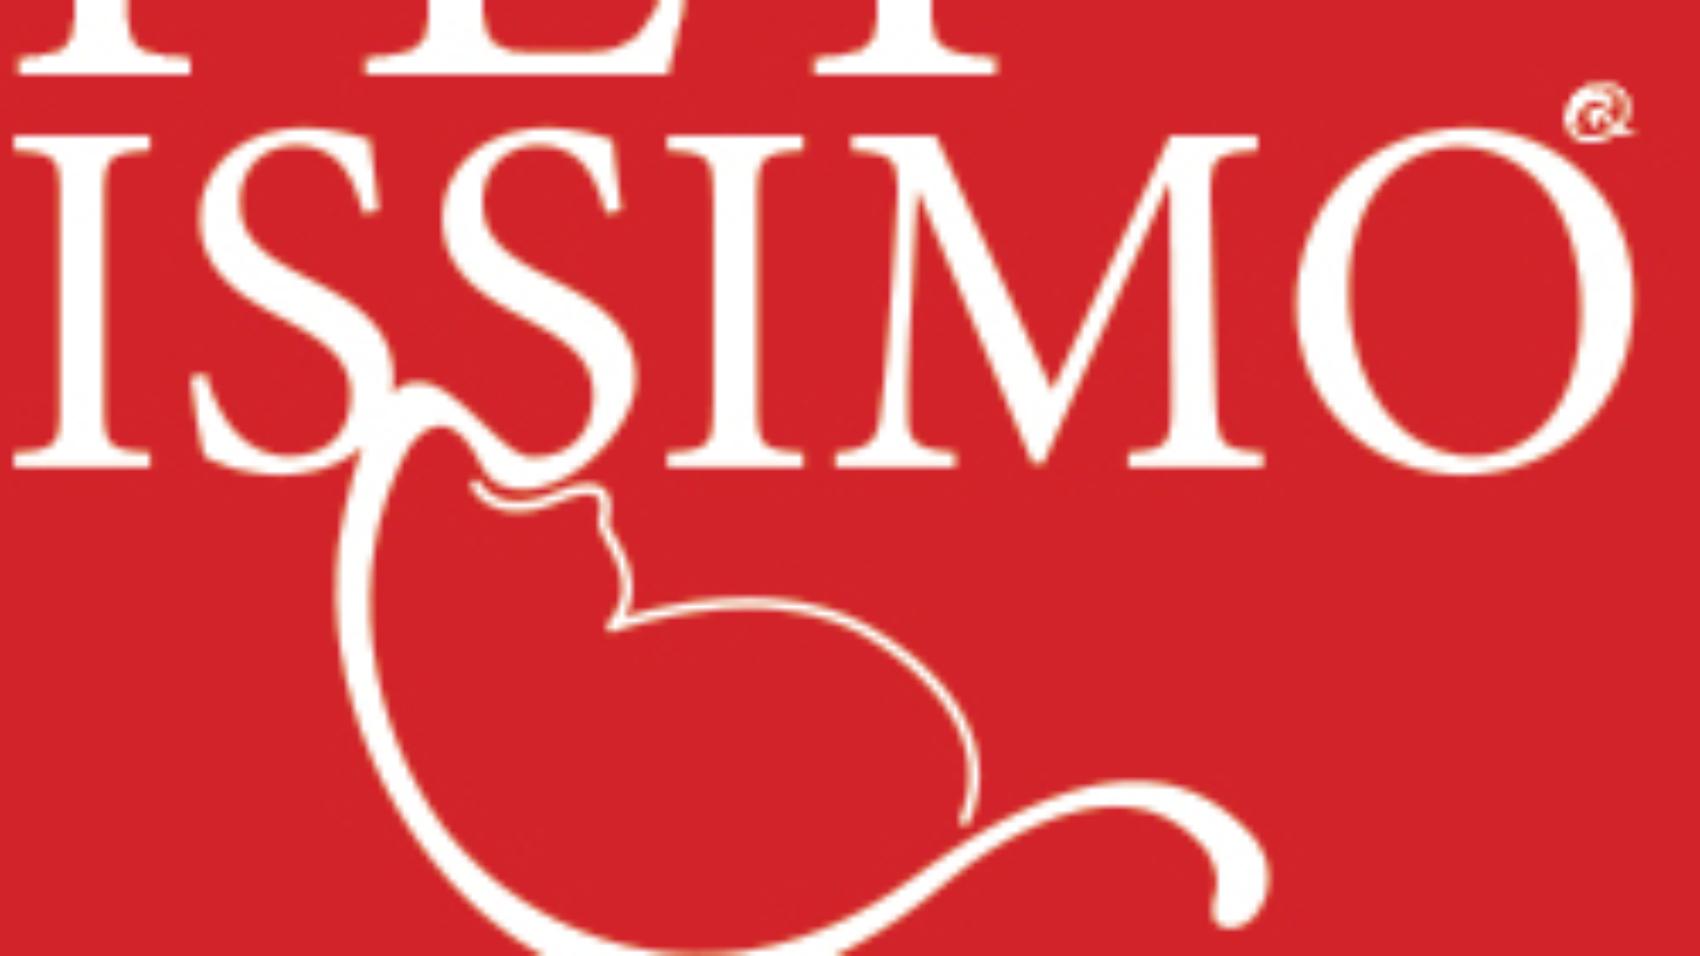 PETISSIMO-LOGO-ITA